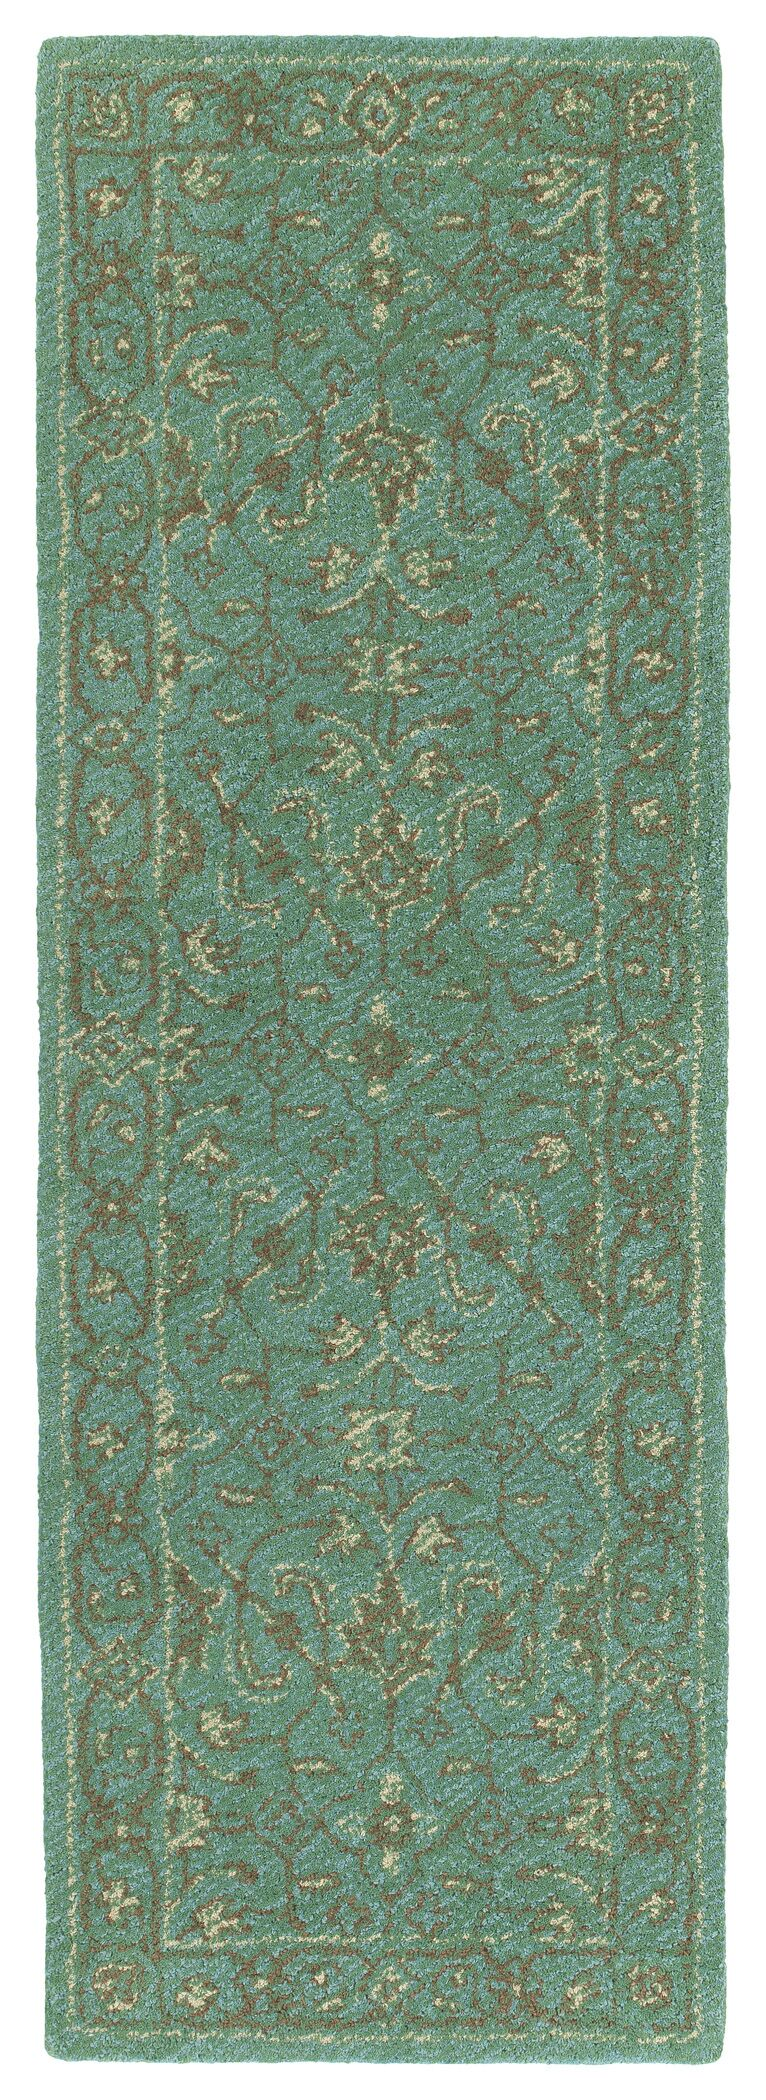 Dittmar Handmade Turquoise Indoor/Outdoor Area Rug Rug Size: Rectangle 8' x 10'